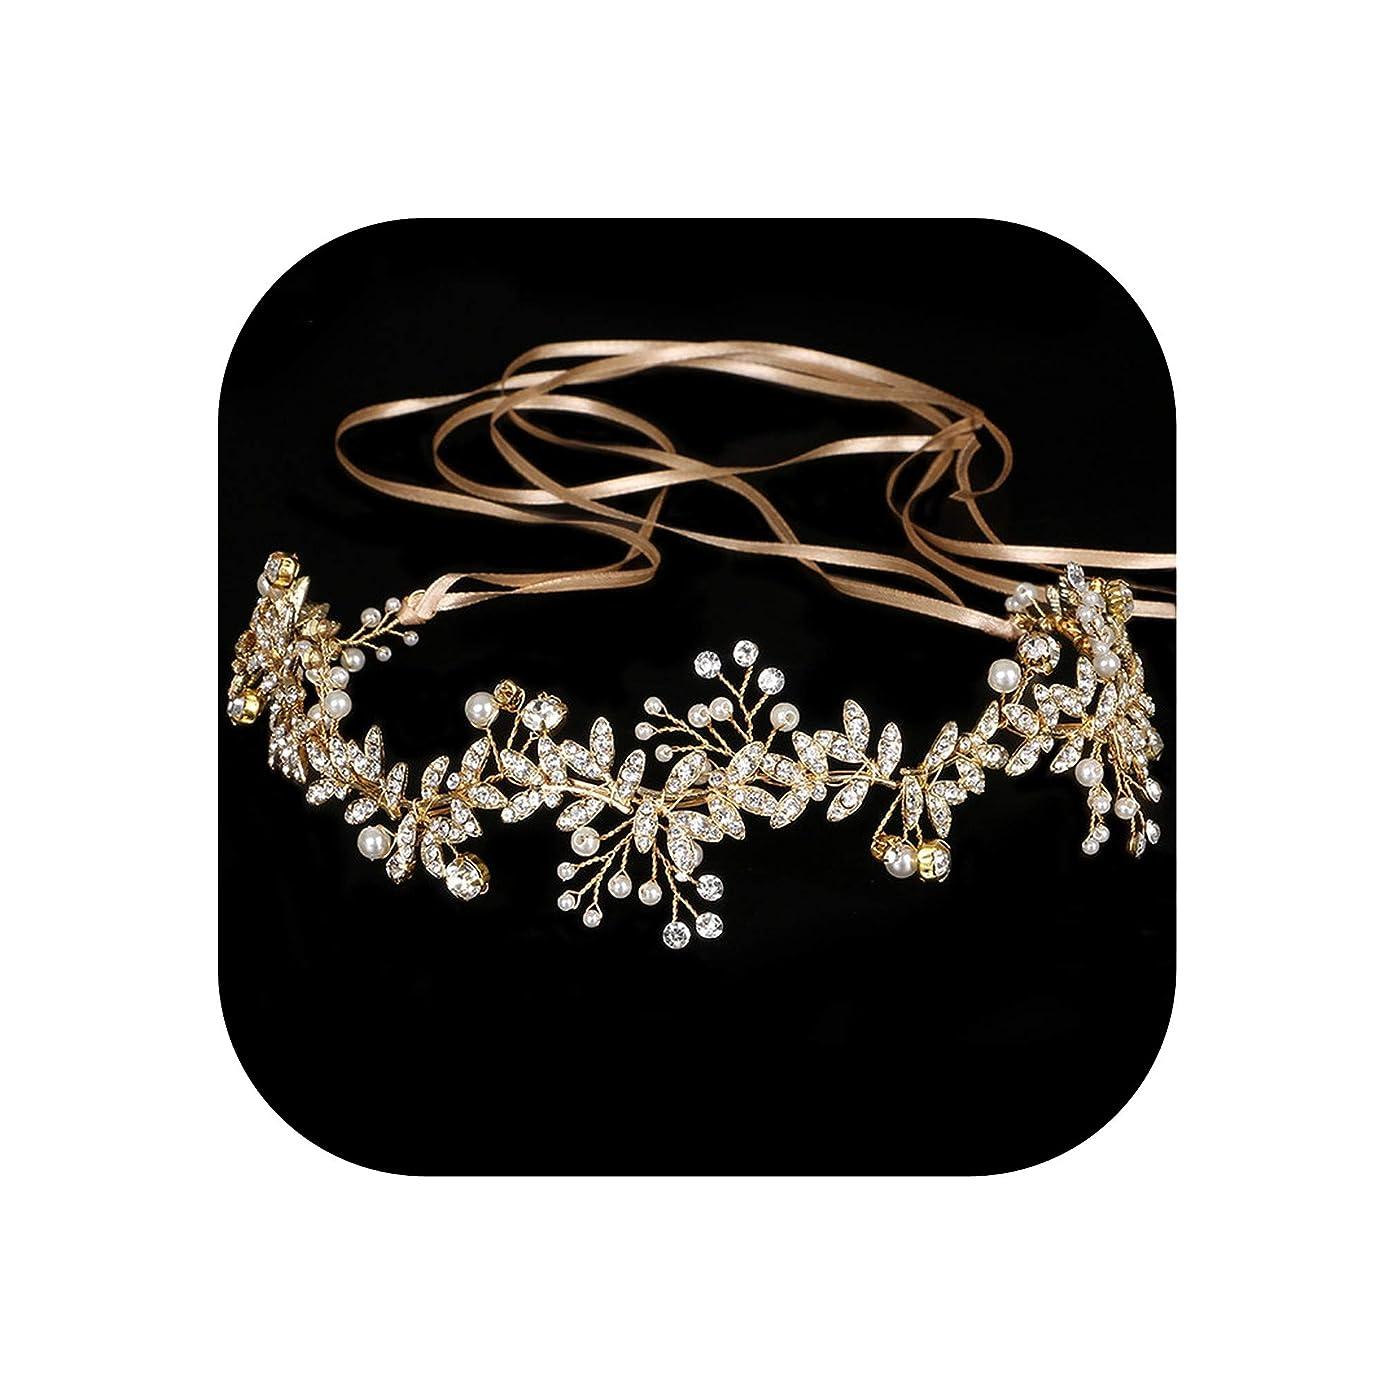 Vintage Diamante 100% Handmade Bridal Headband Gold Pearl Wedding Hairpieces Wedding Hair Tiaras Re733,Gold-Color